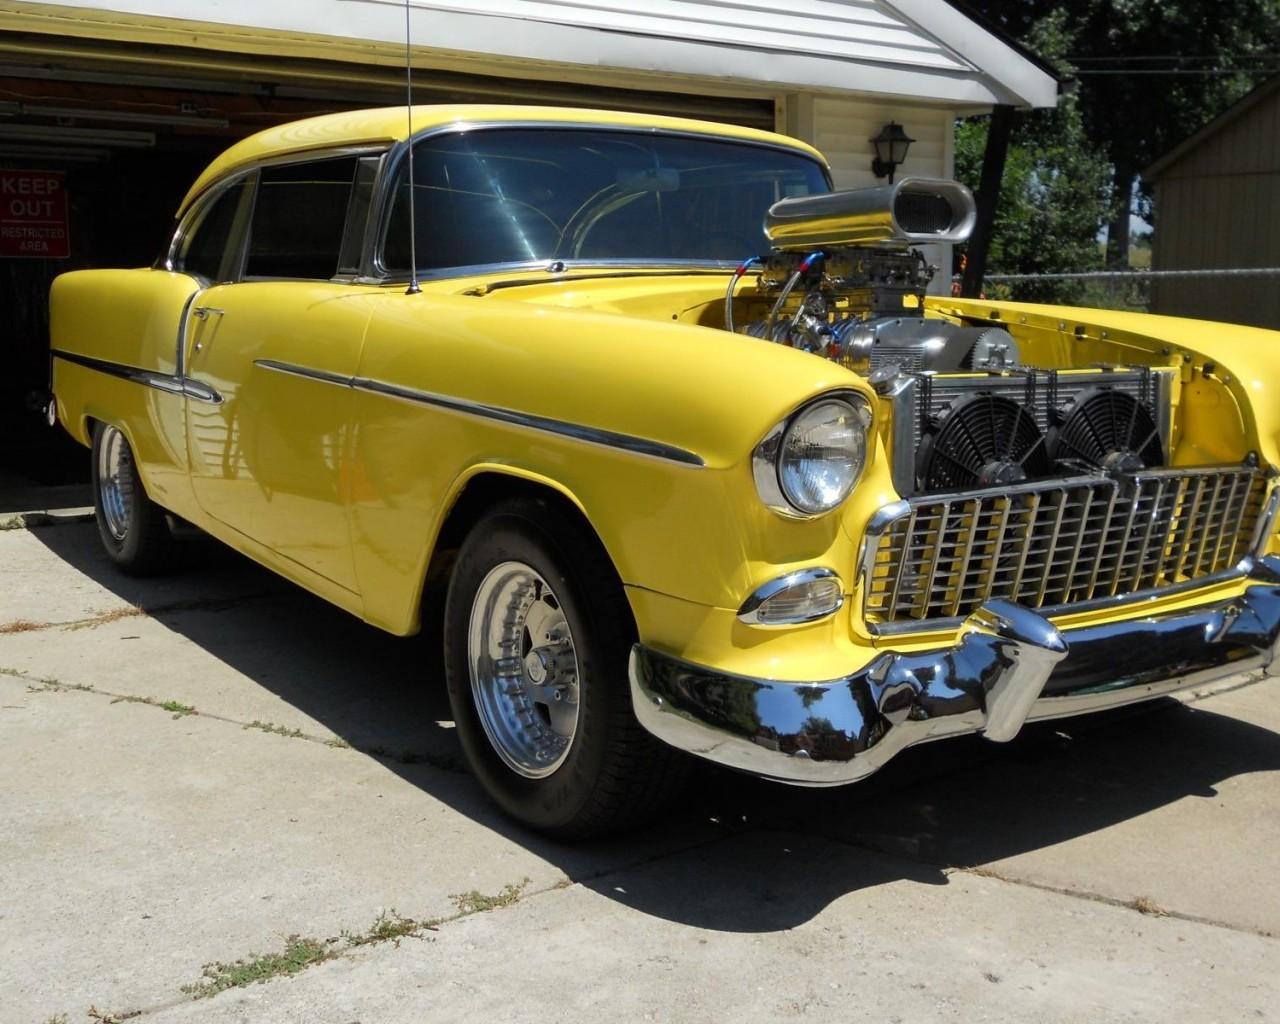 1955 Chevrolet wallpaper 1280x1024